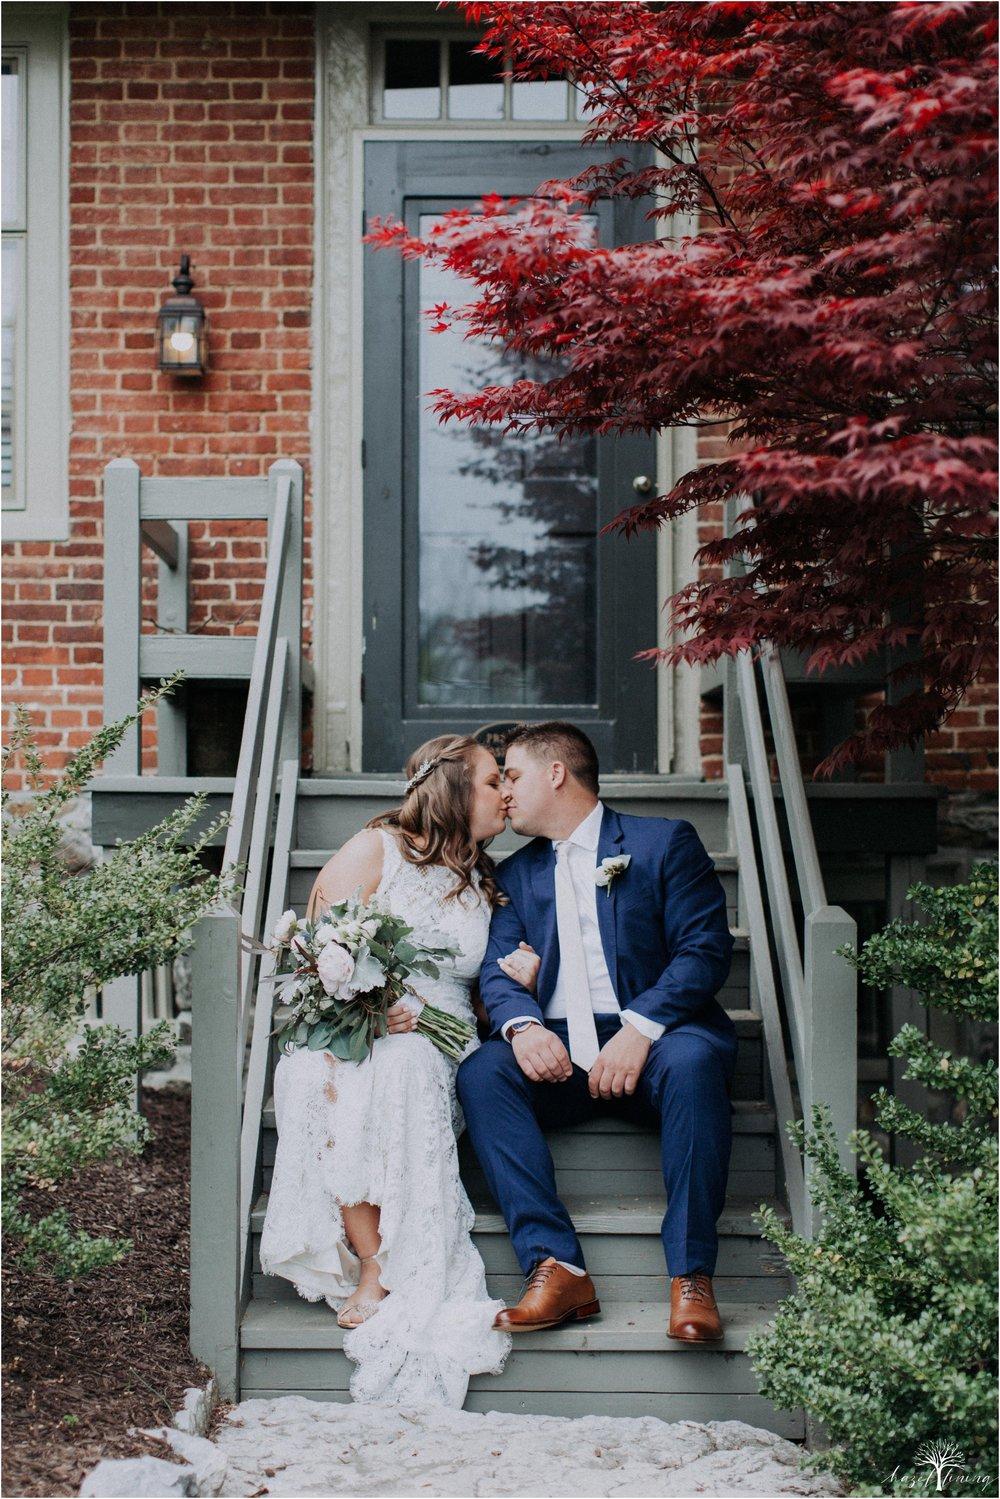 hazel-lining-travel-wedding-elopement-photography-abby-skyler-hunt-the-willis-house-york-pennsylvania-outdoor-estate-wedding_0040.jpg